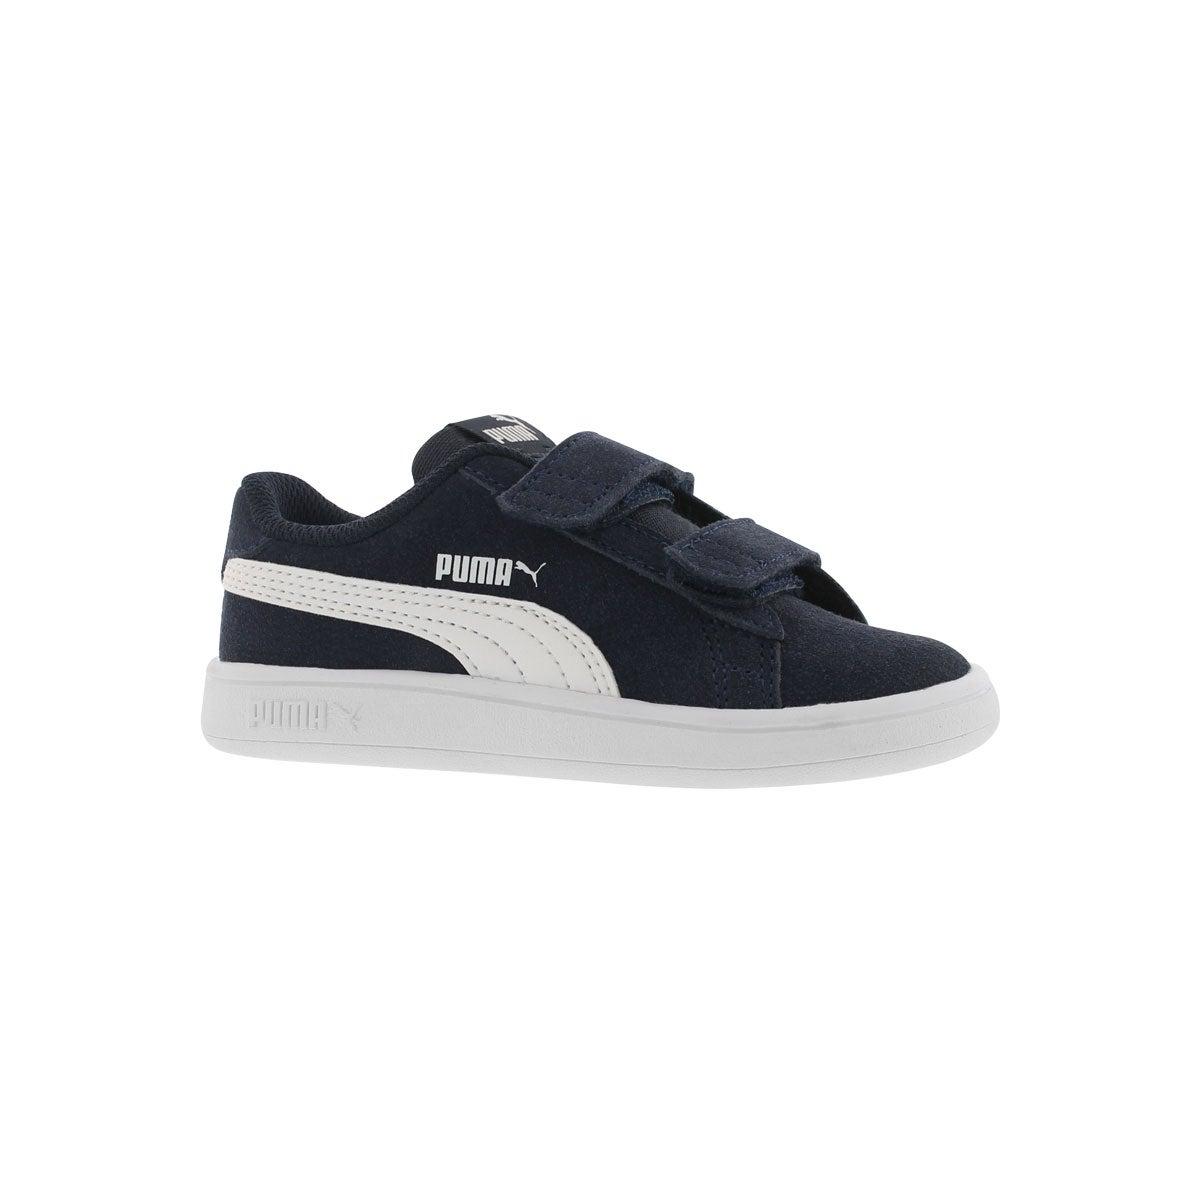 Infants' PUMA SMASH V2 peacoat sneakers